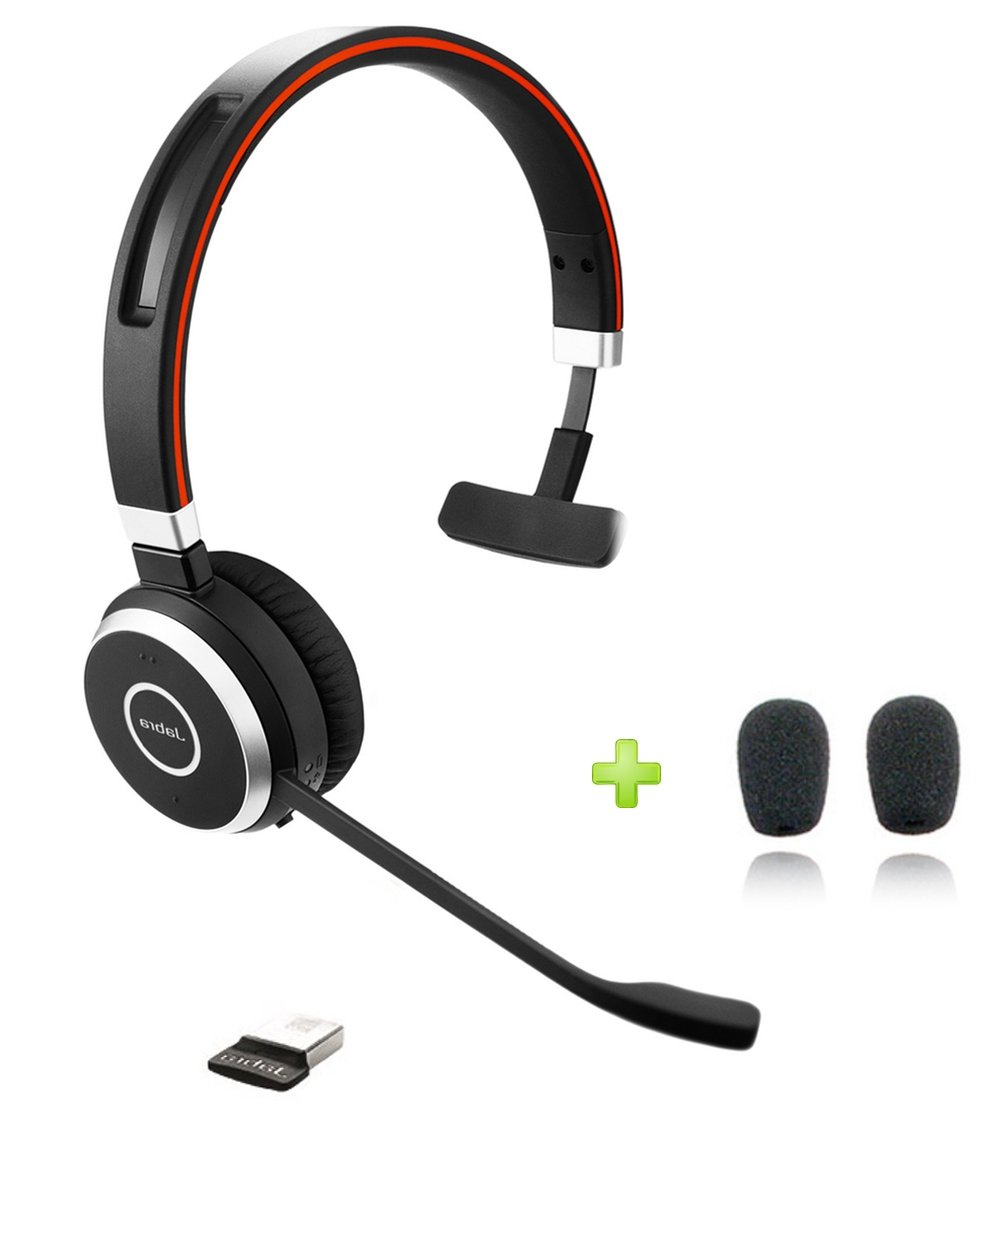 Jabra Evolve 65 Bluetooth UC Mono Headset Bundle | Bonus Mic Cushions and USB Dongle | Compatible with Softphones, Smartphones, Tablets, PC/MAC | 6593-829-409